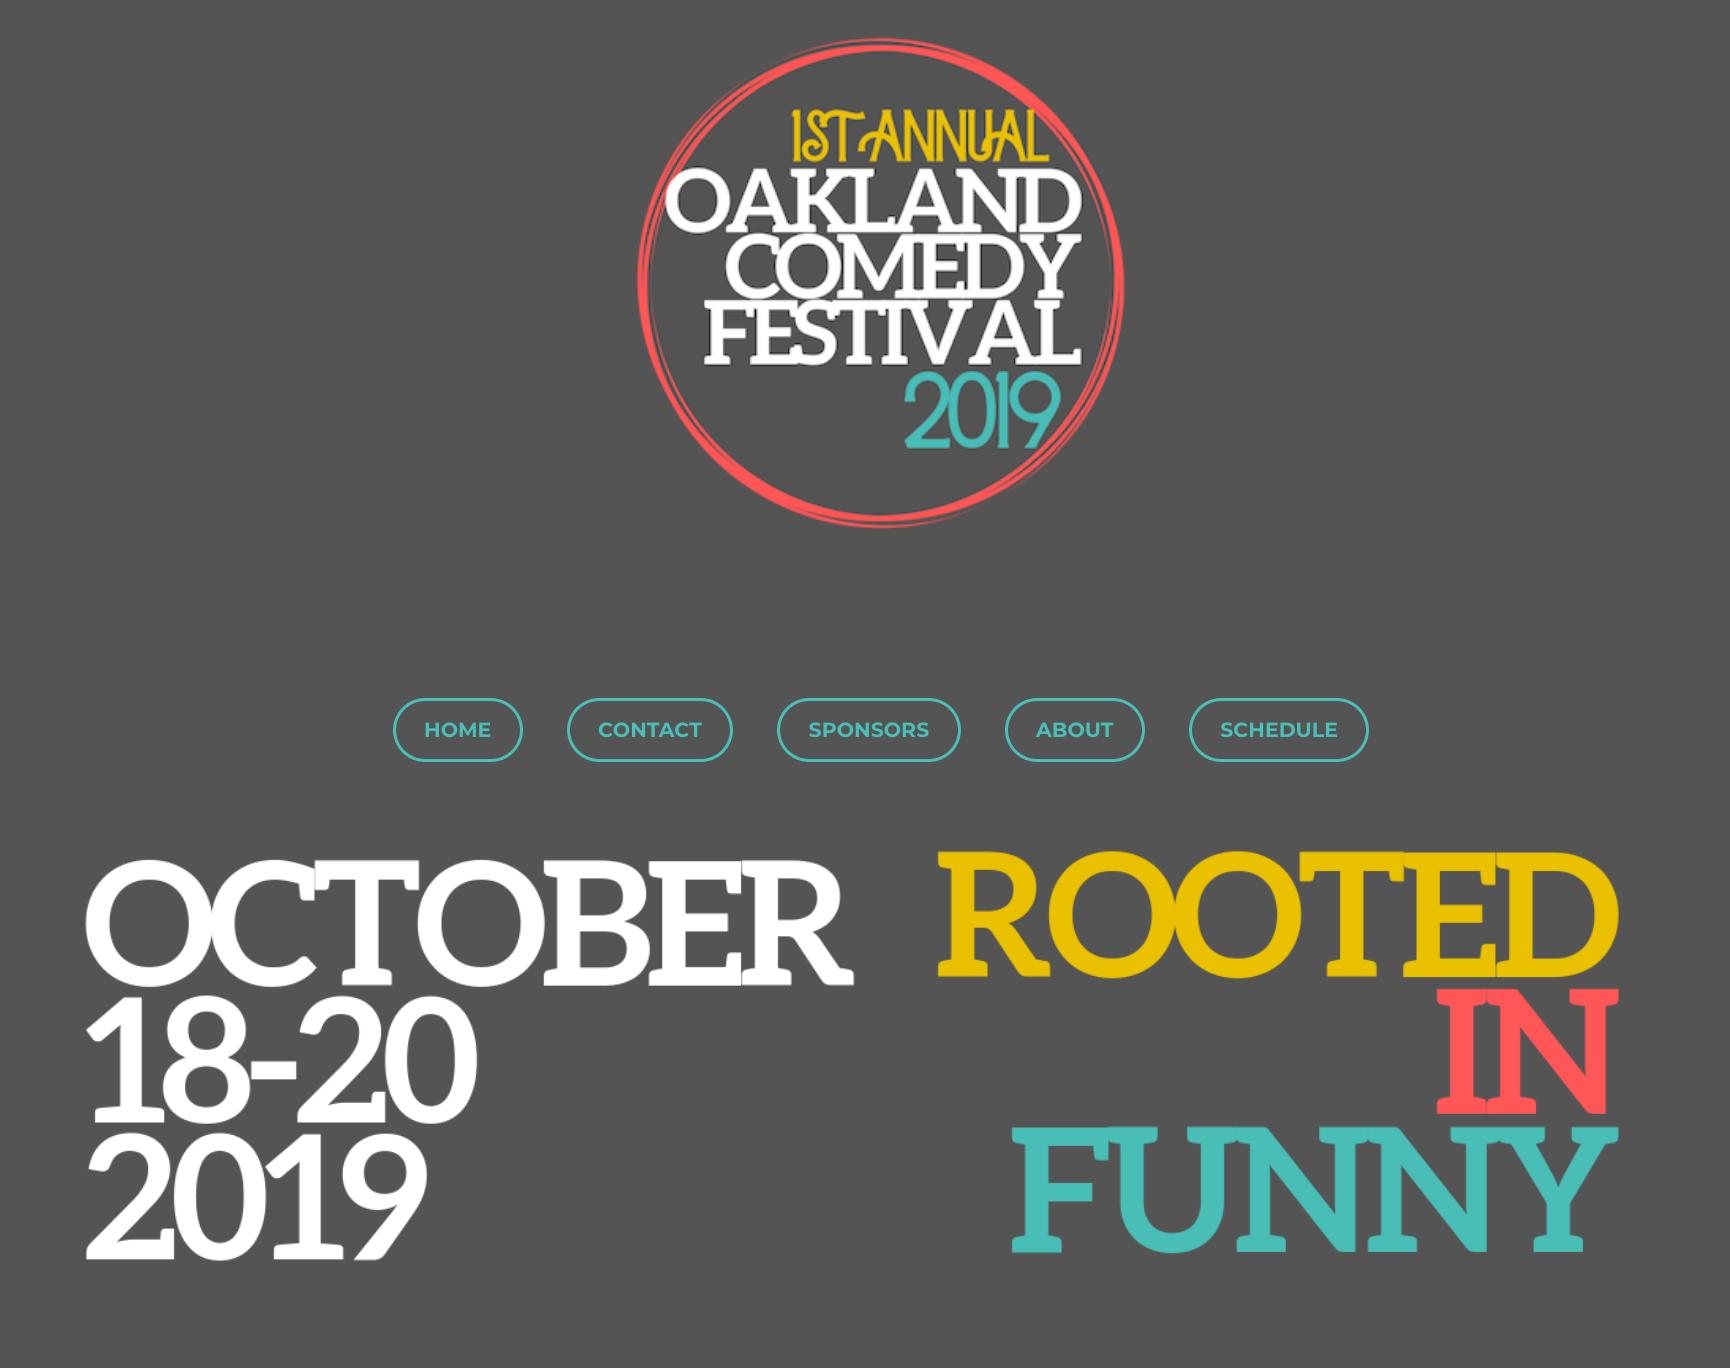 oakland comedy festival